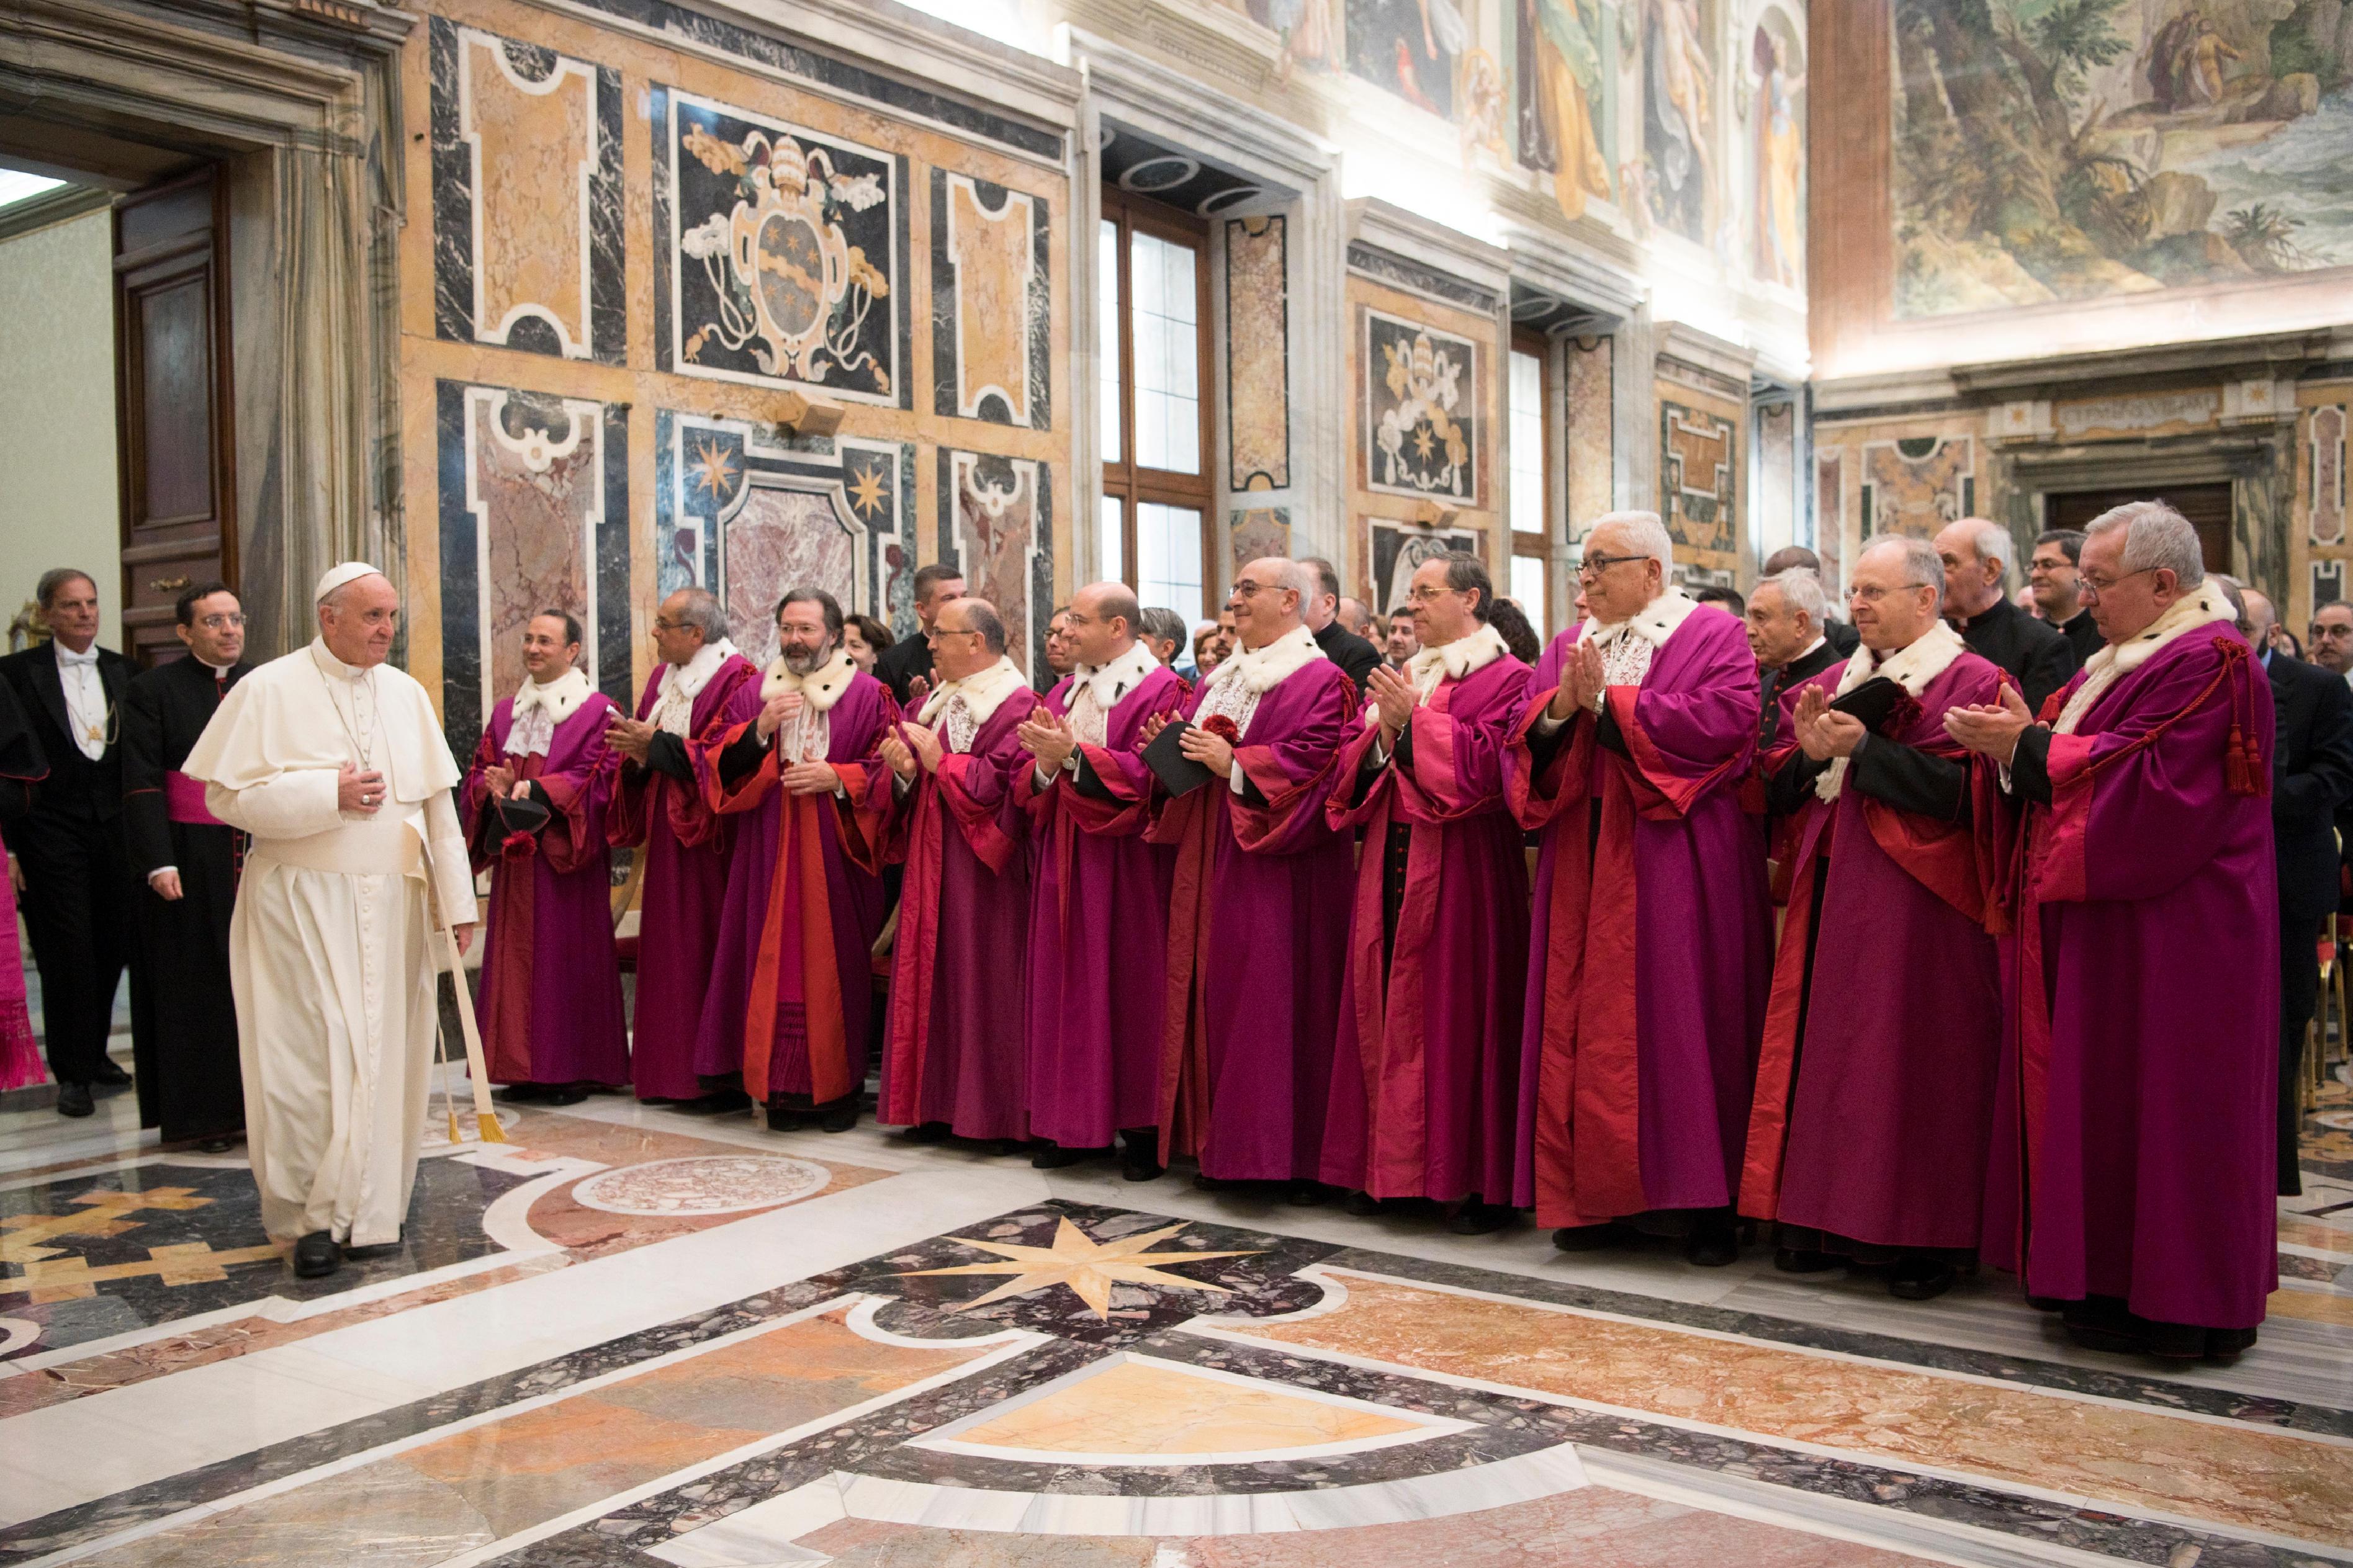 Inauguration de l'année judiciaire de la Rote romaine © Vatican Media